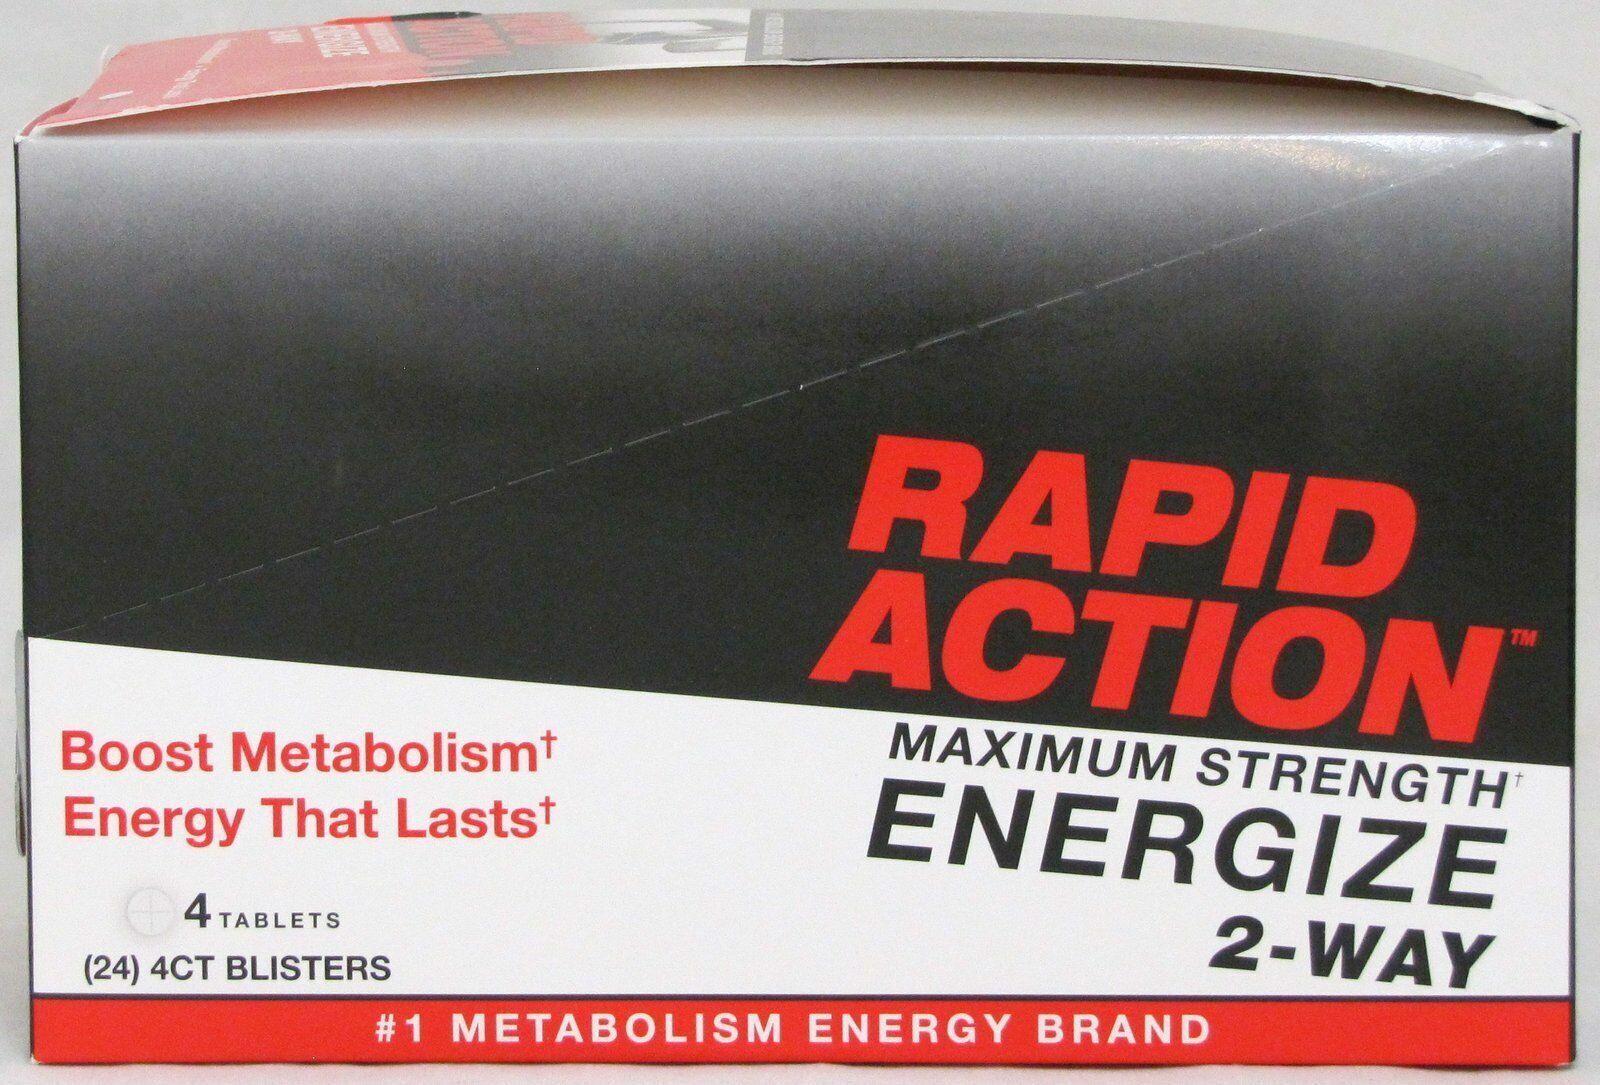 Rapid Action Energize 2 Way Lasting Energy Boost Metabolism 24 Packs 96 Pills  1